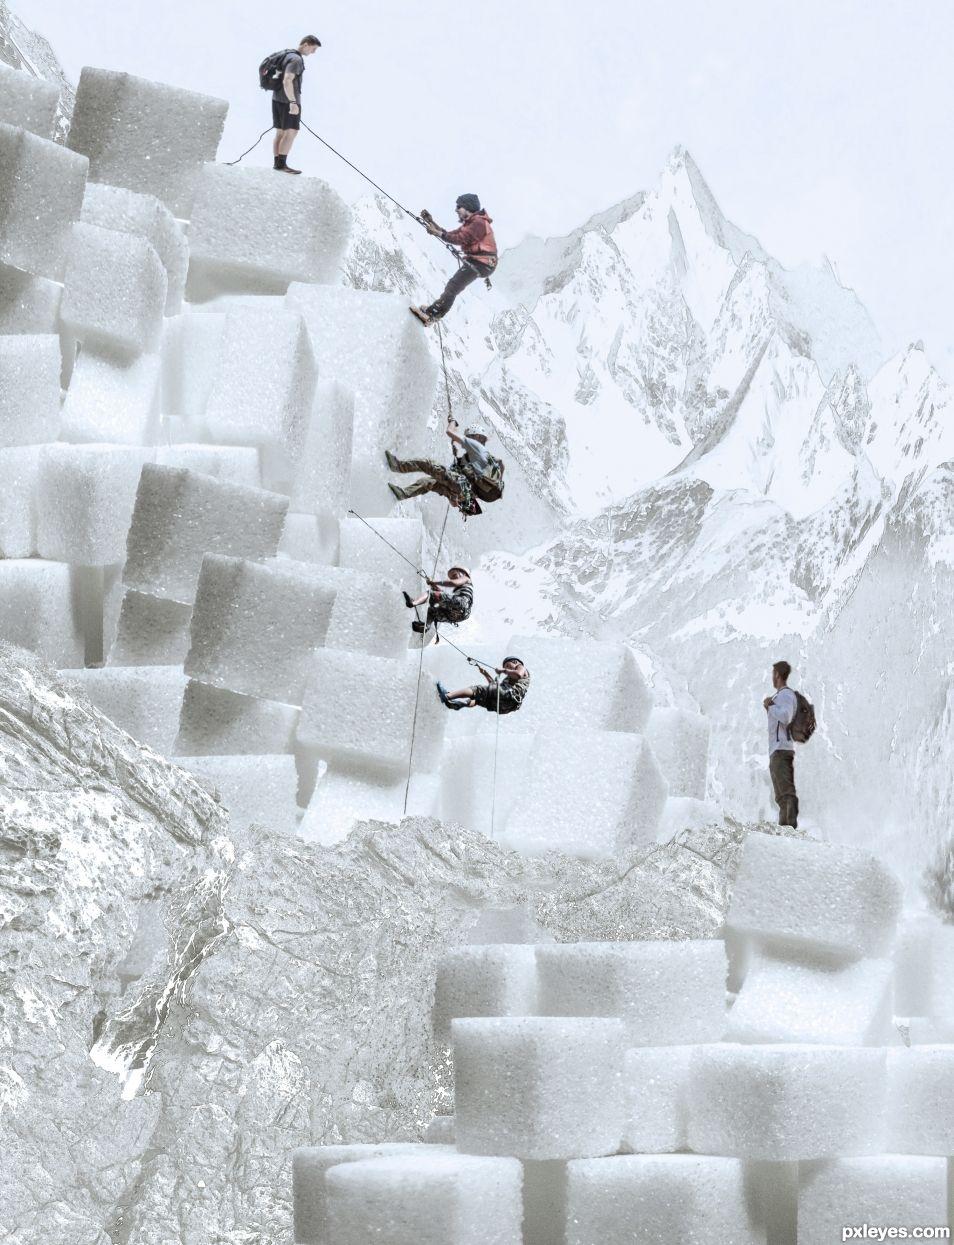 Sugar climbing